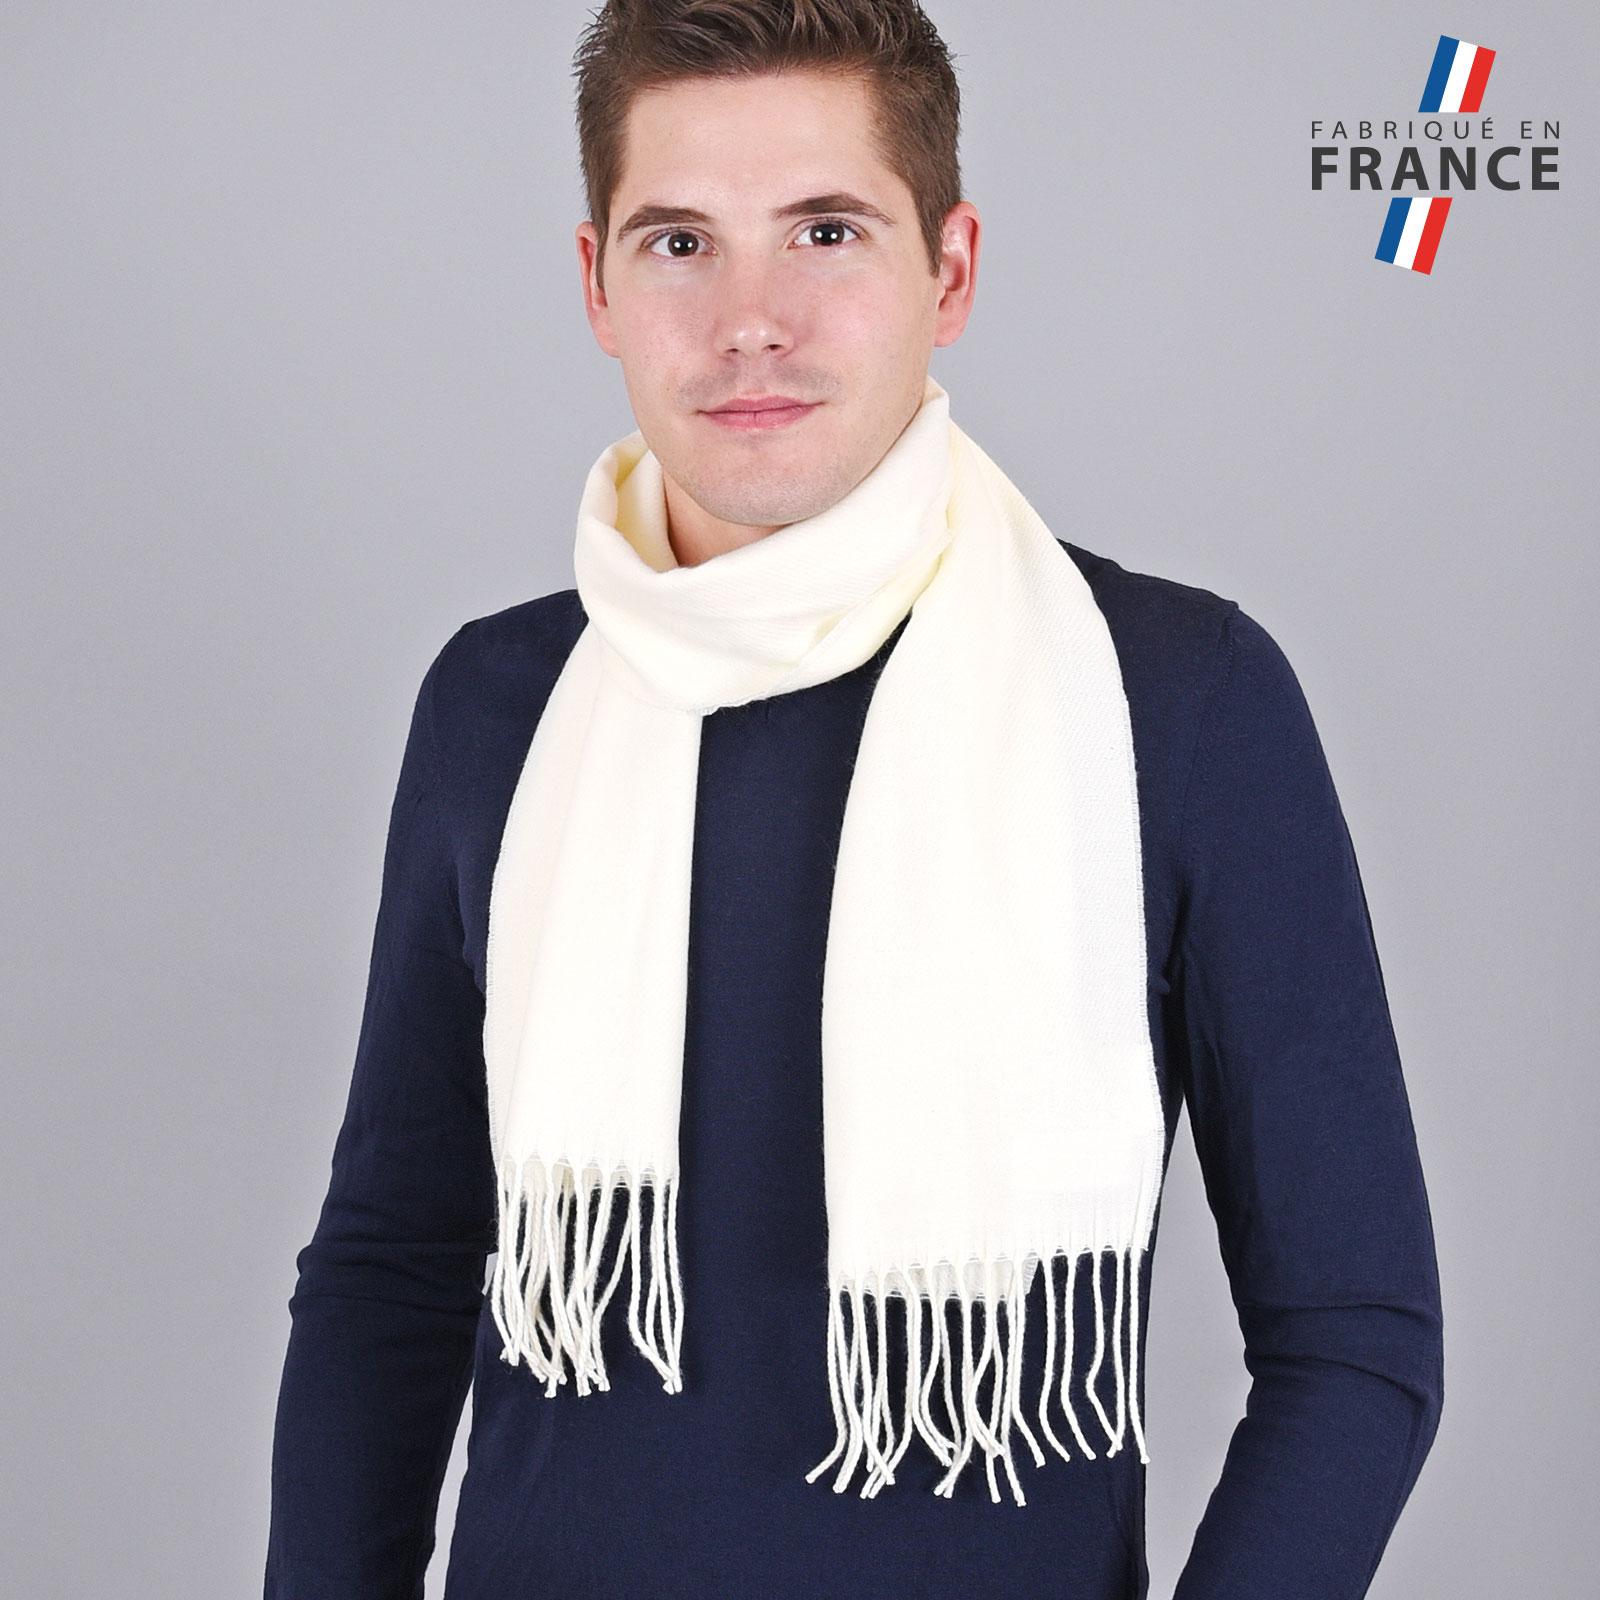 AT-03243-VH16-LB_FR-echarpe-homme-a-franges-ecru-fabrication-francaise